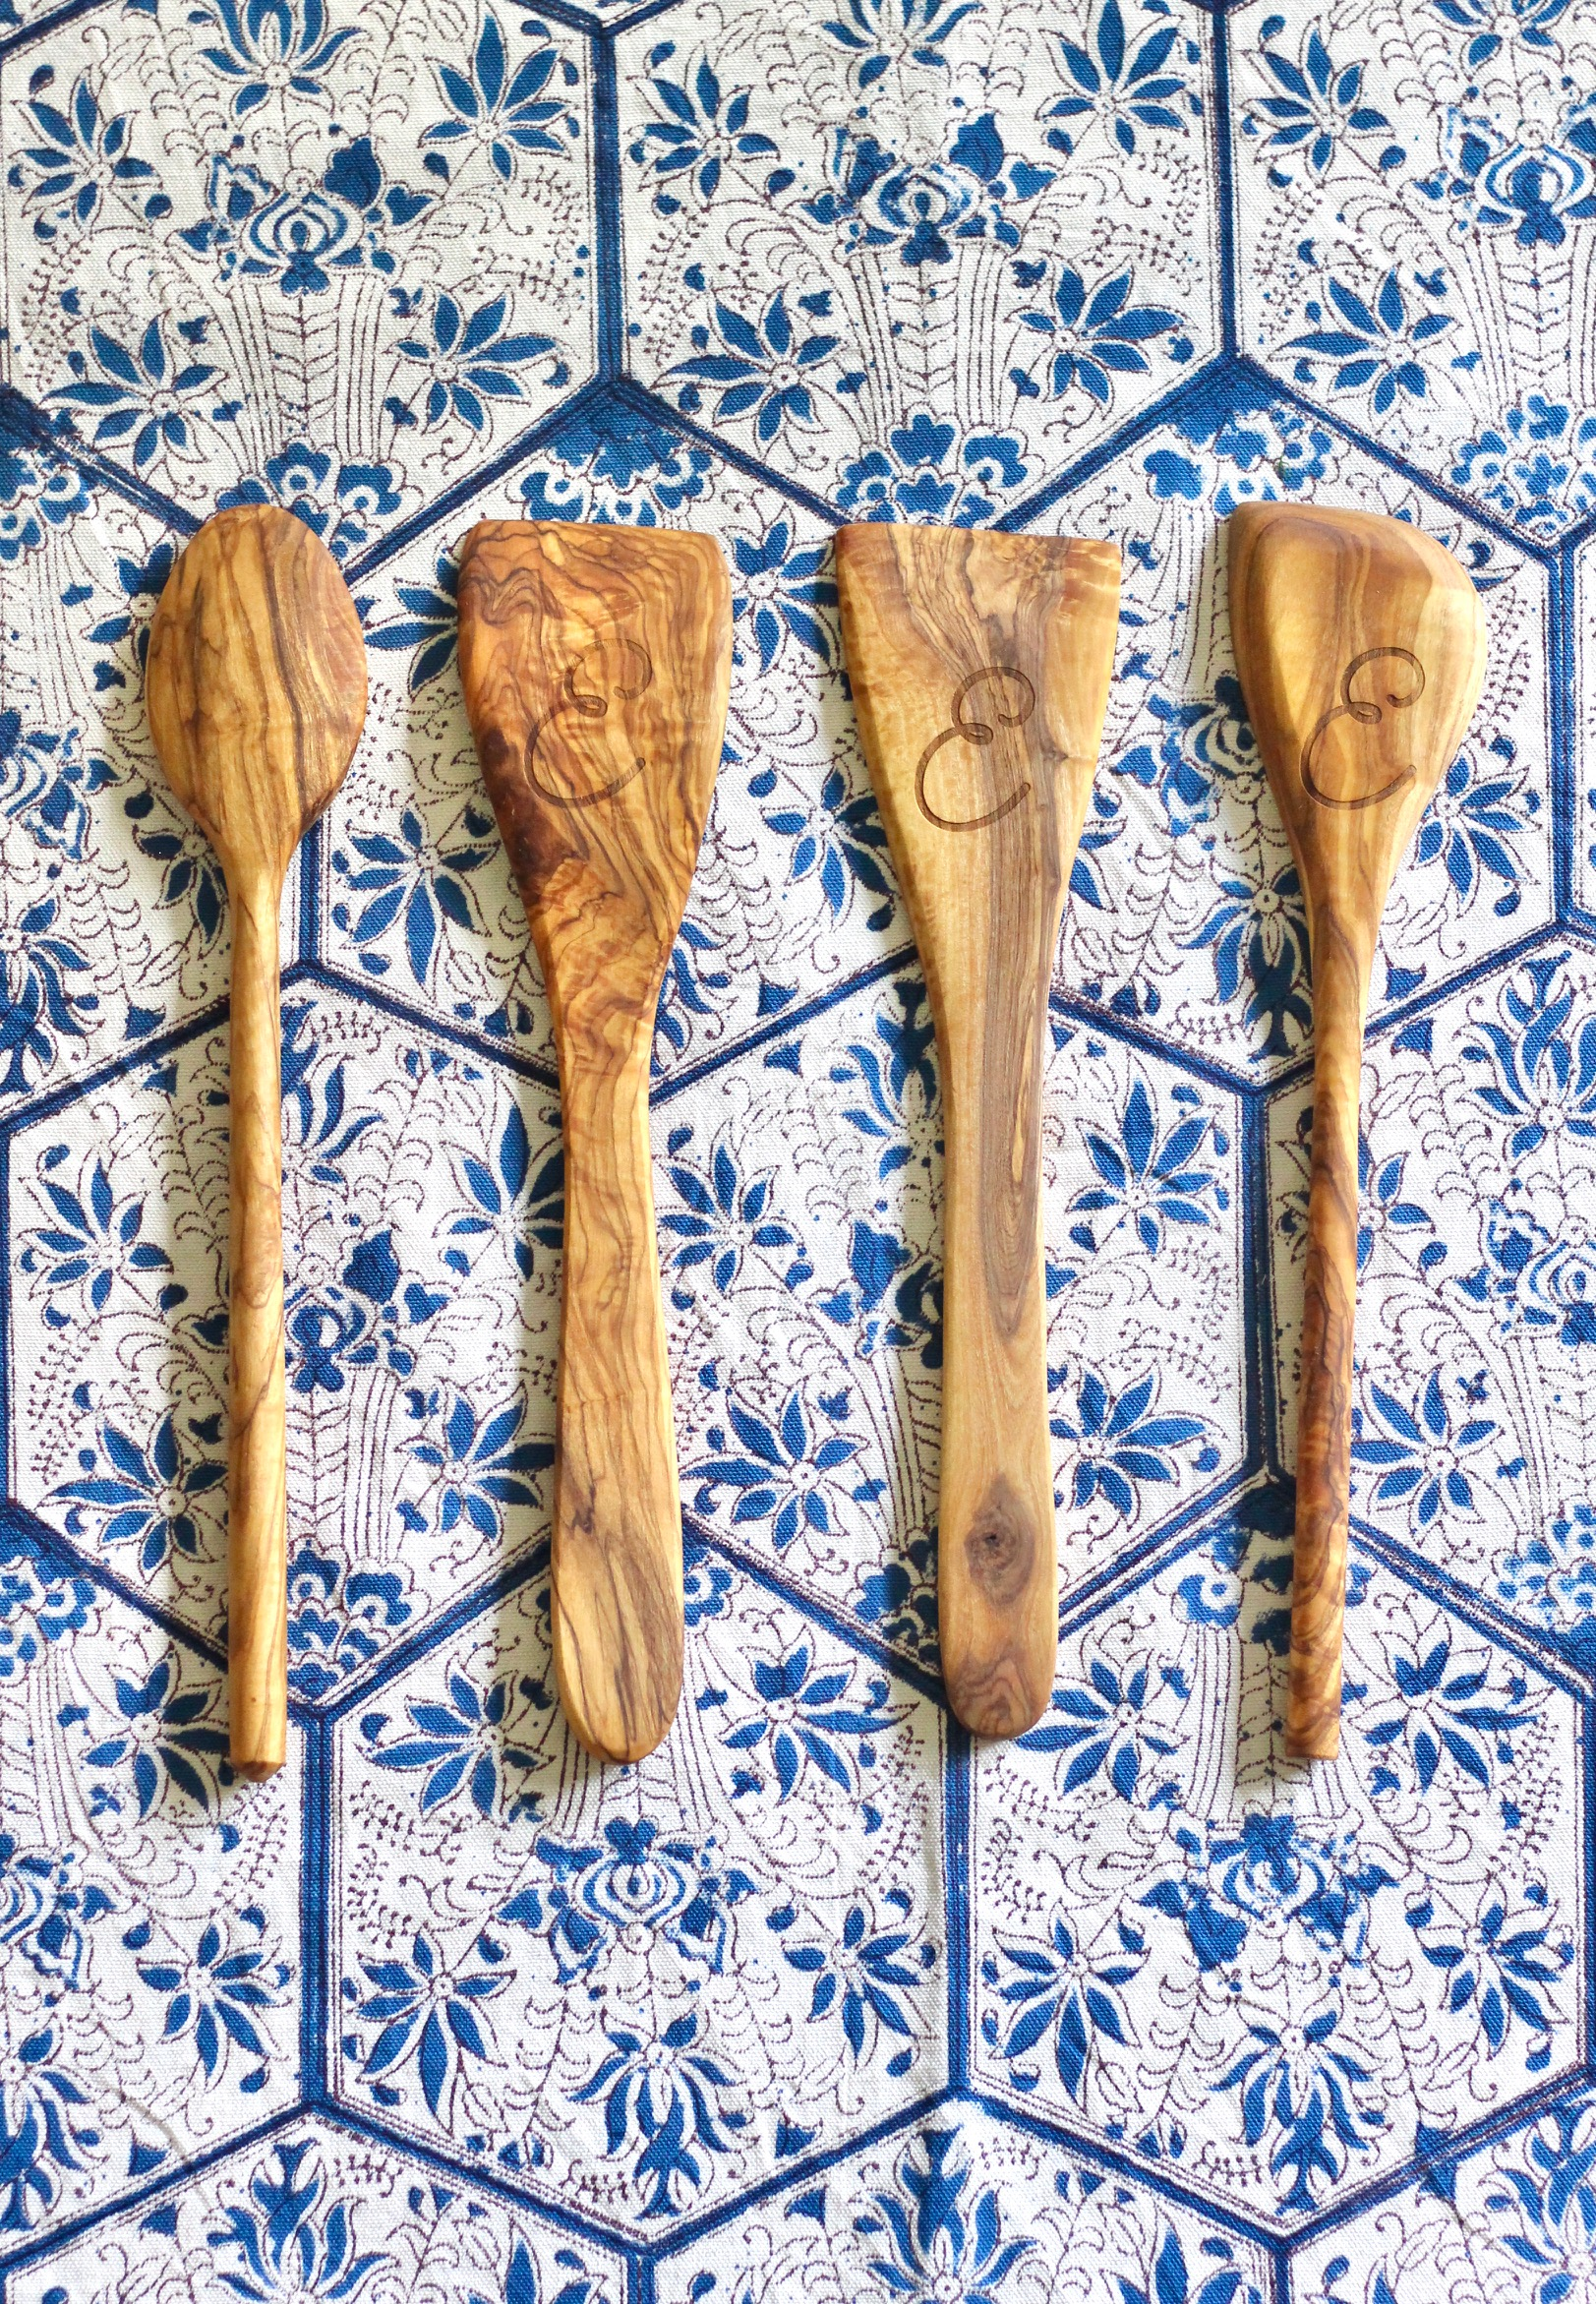 WREN Home Theron Olive Wood Utensil Set